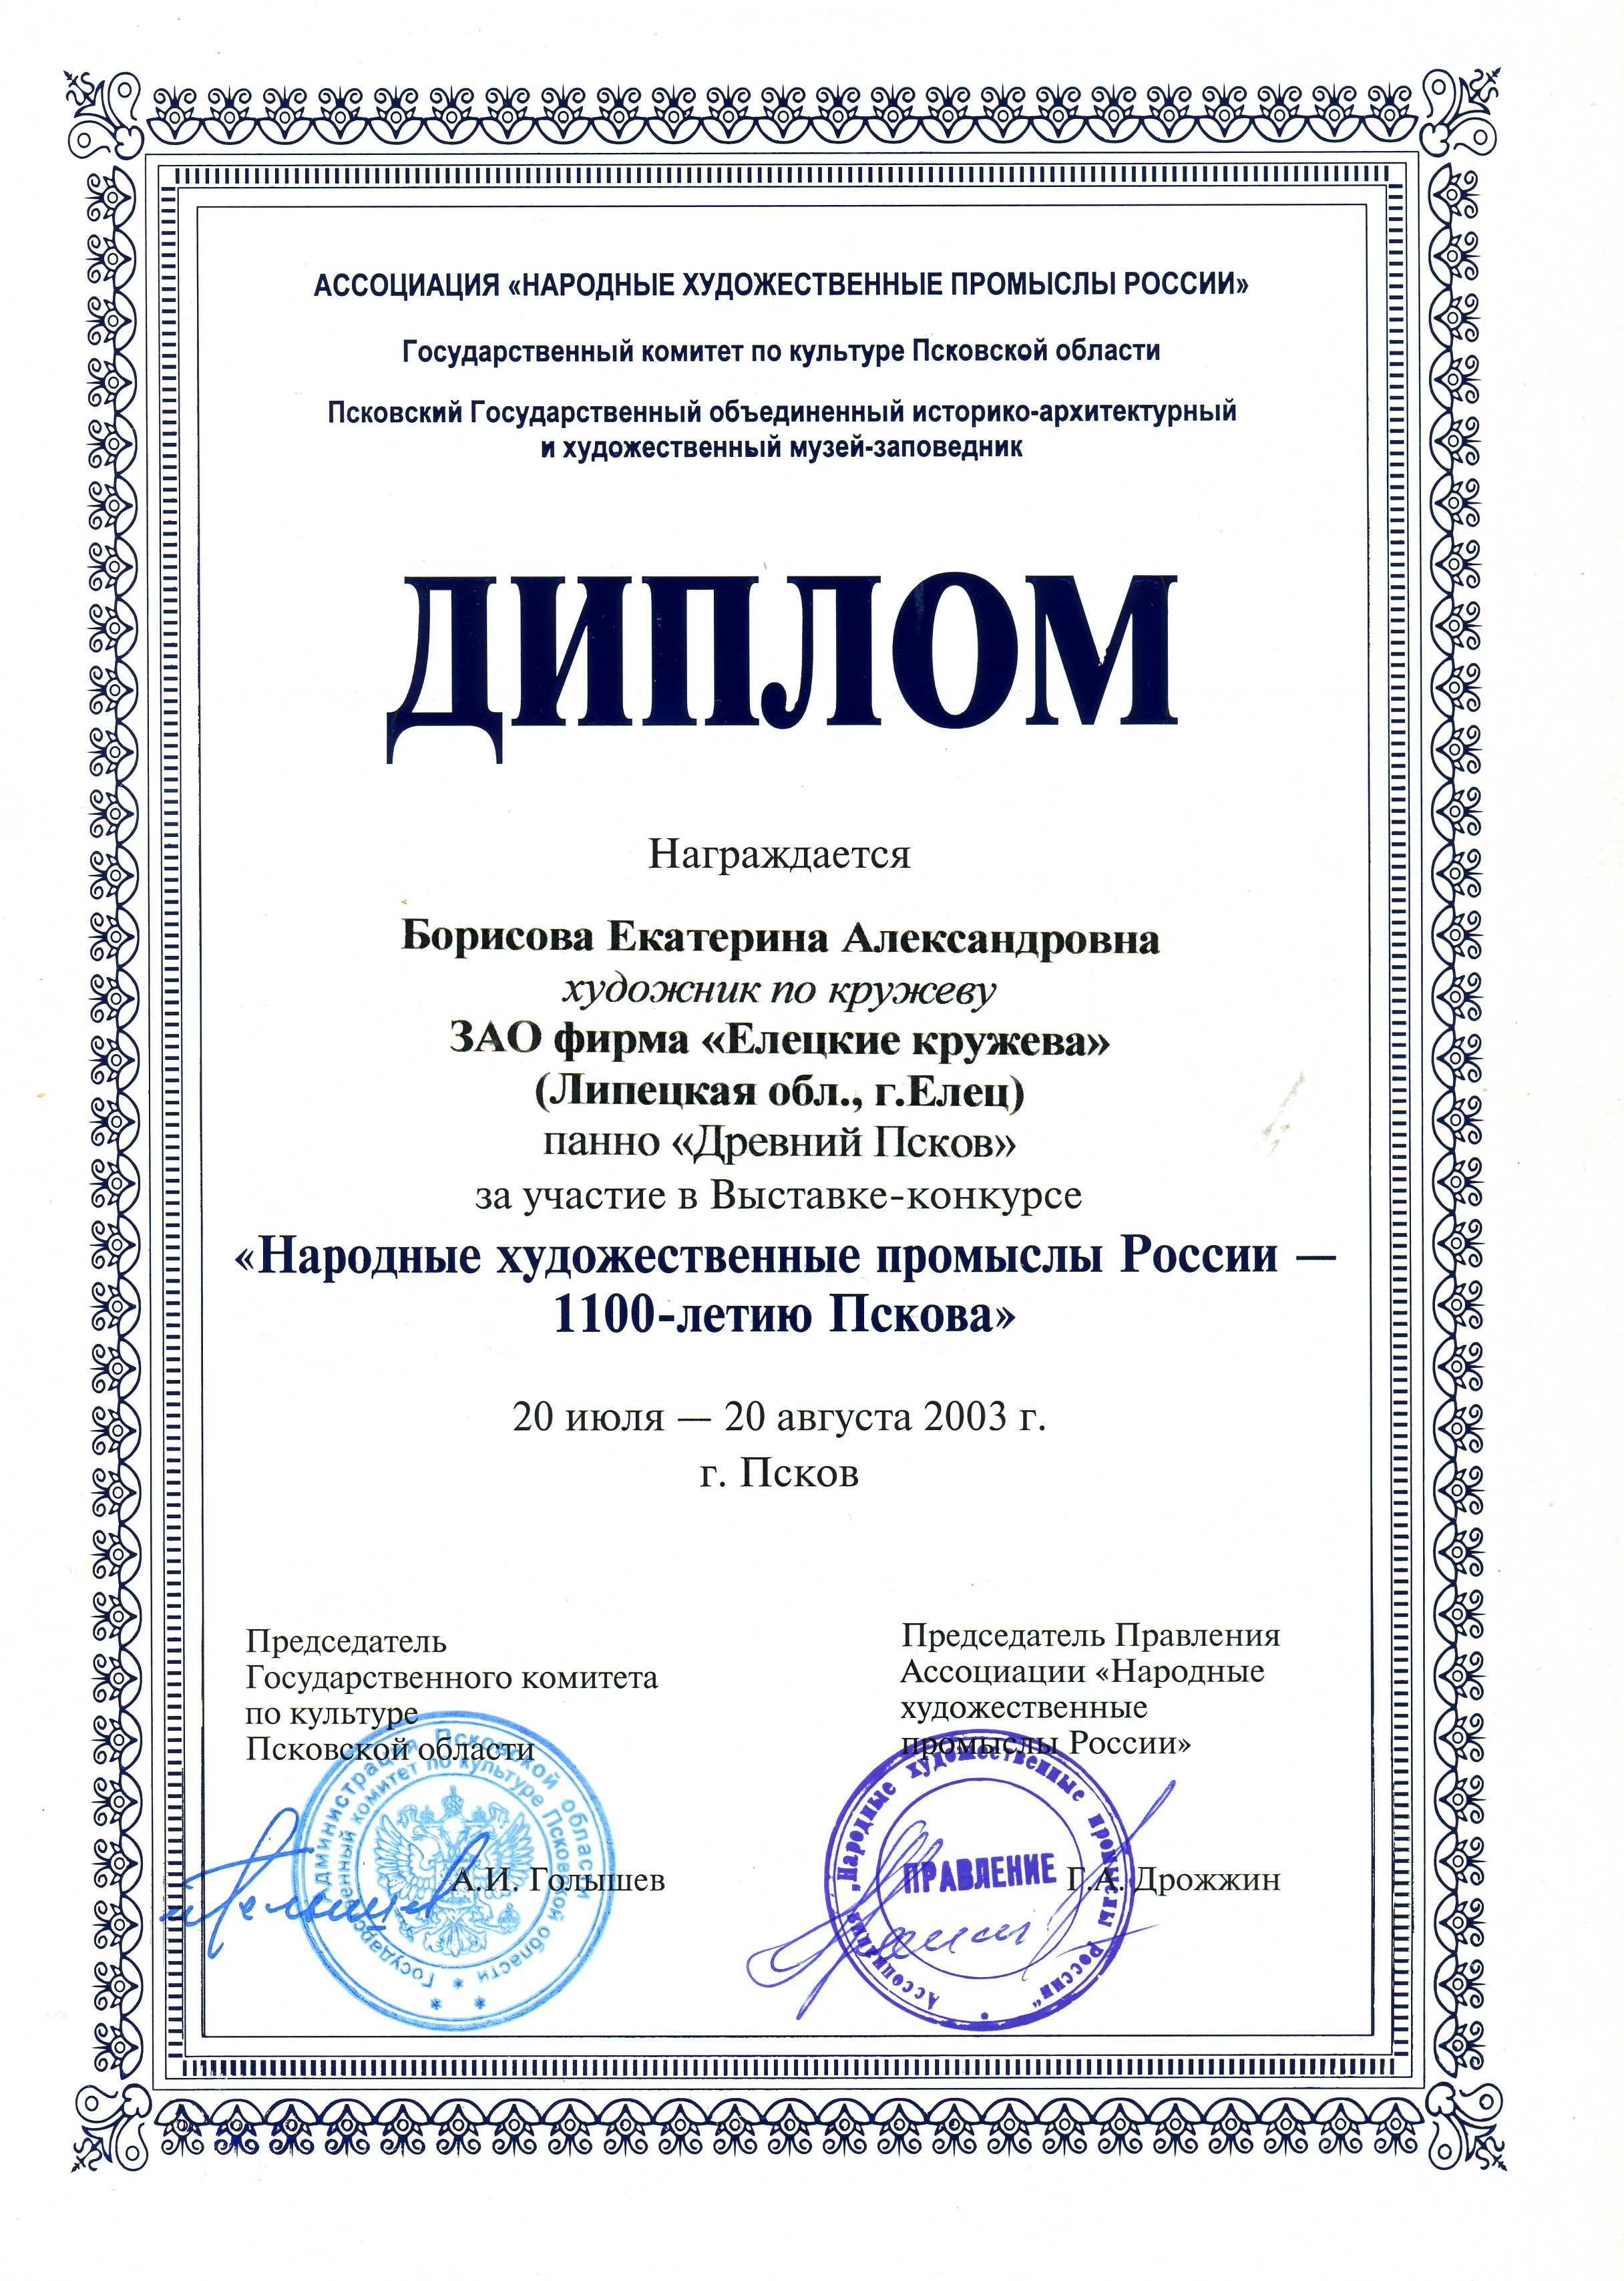 Выставка-конкурс, 2003 г.